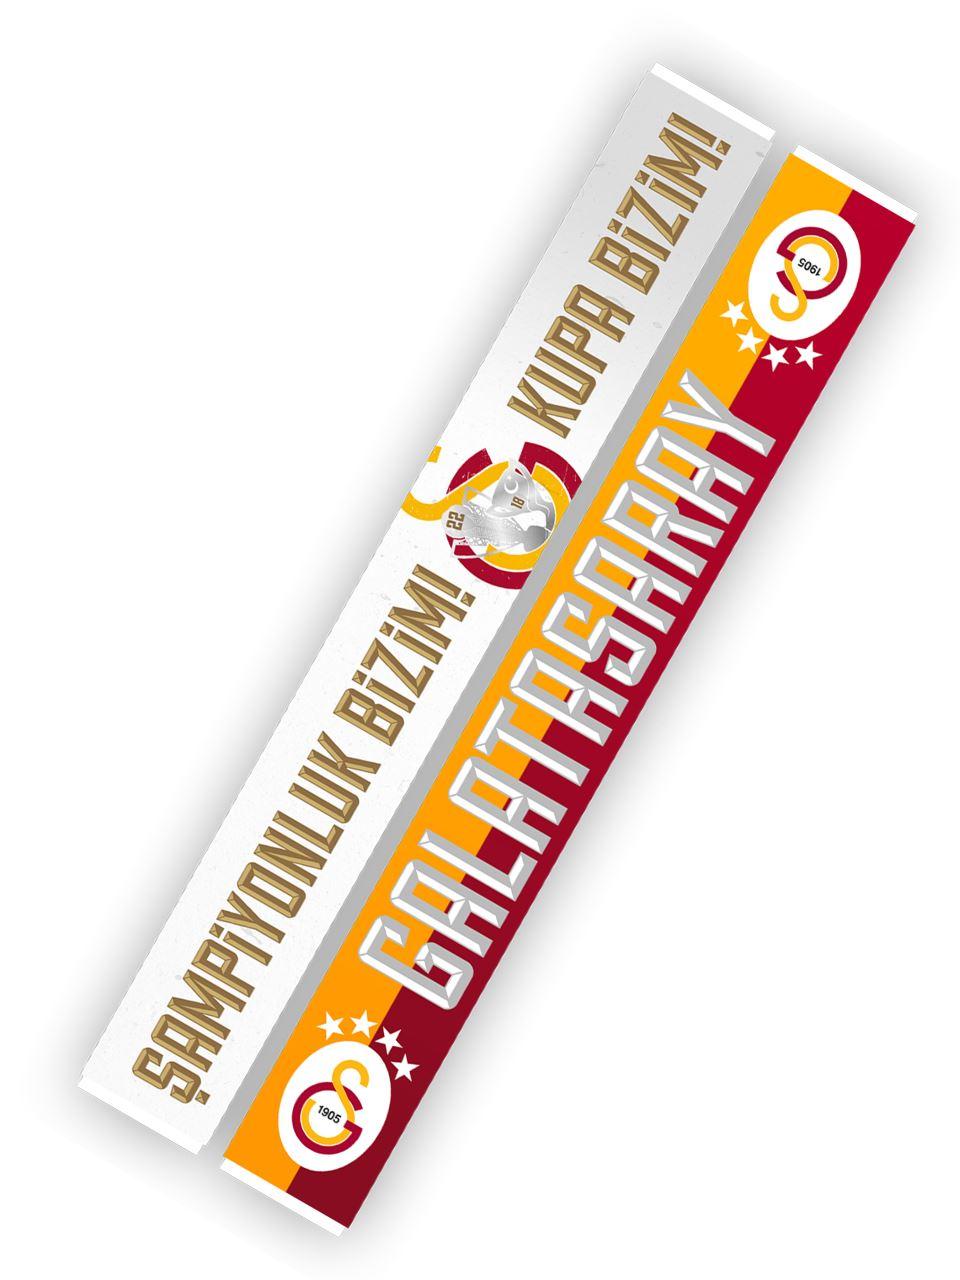 Galatasaray Şampiyonluk Bizim! Kupa Bizim! Şal Atkı U191276